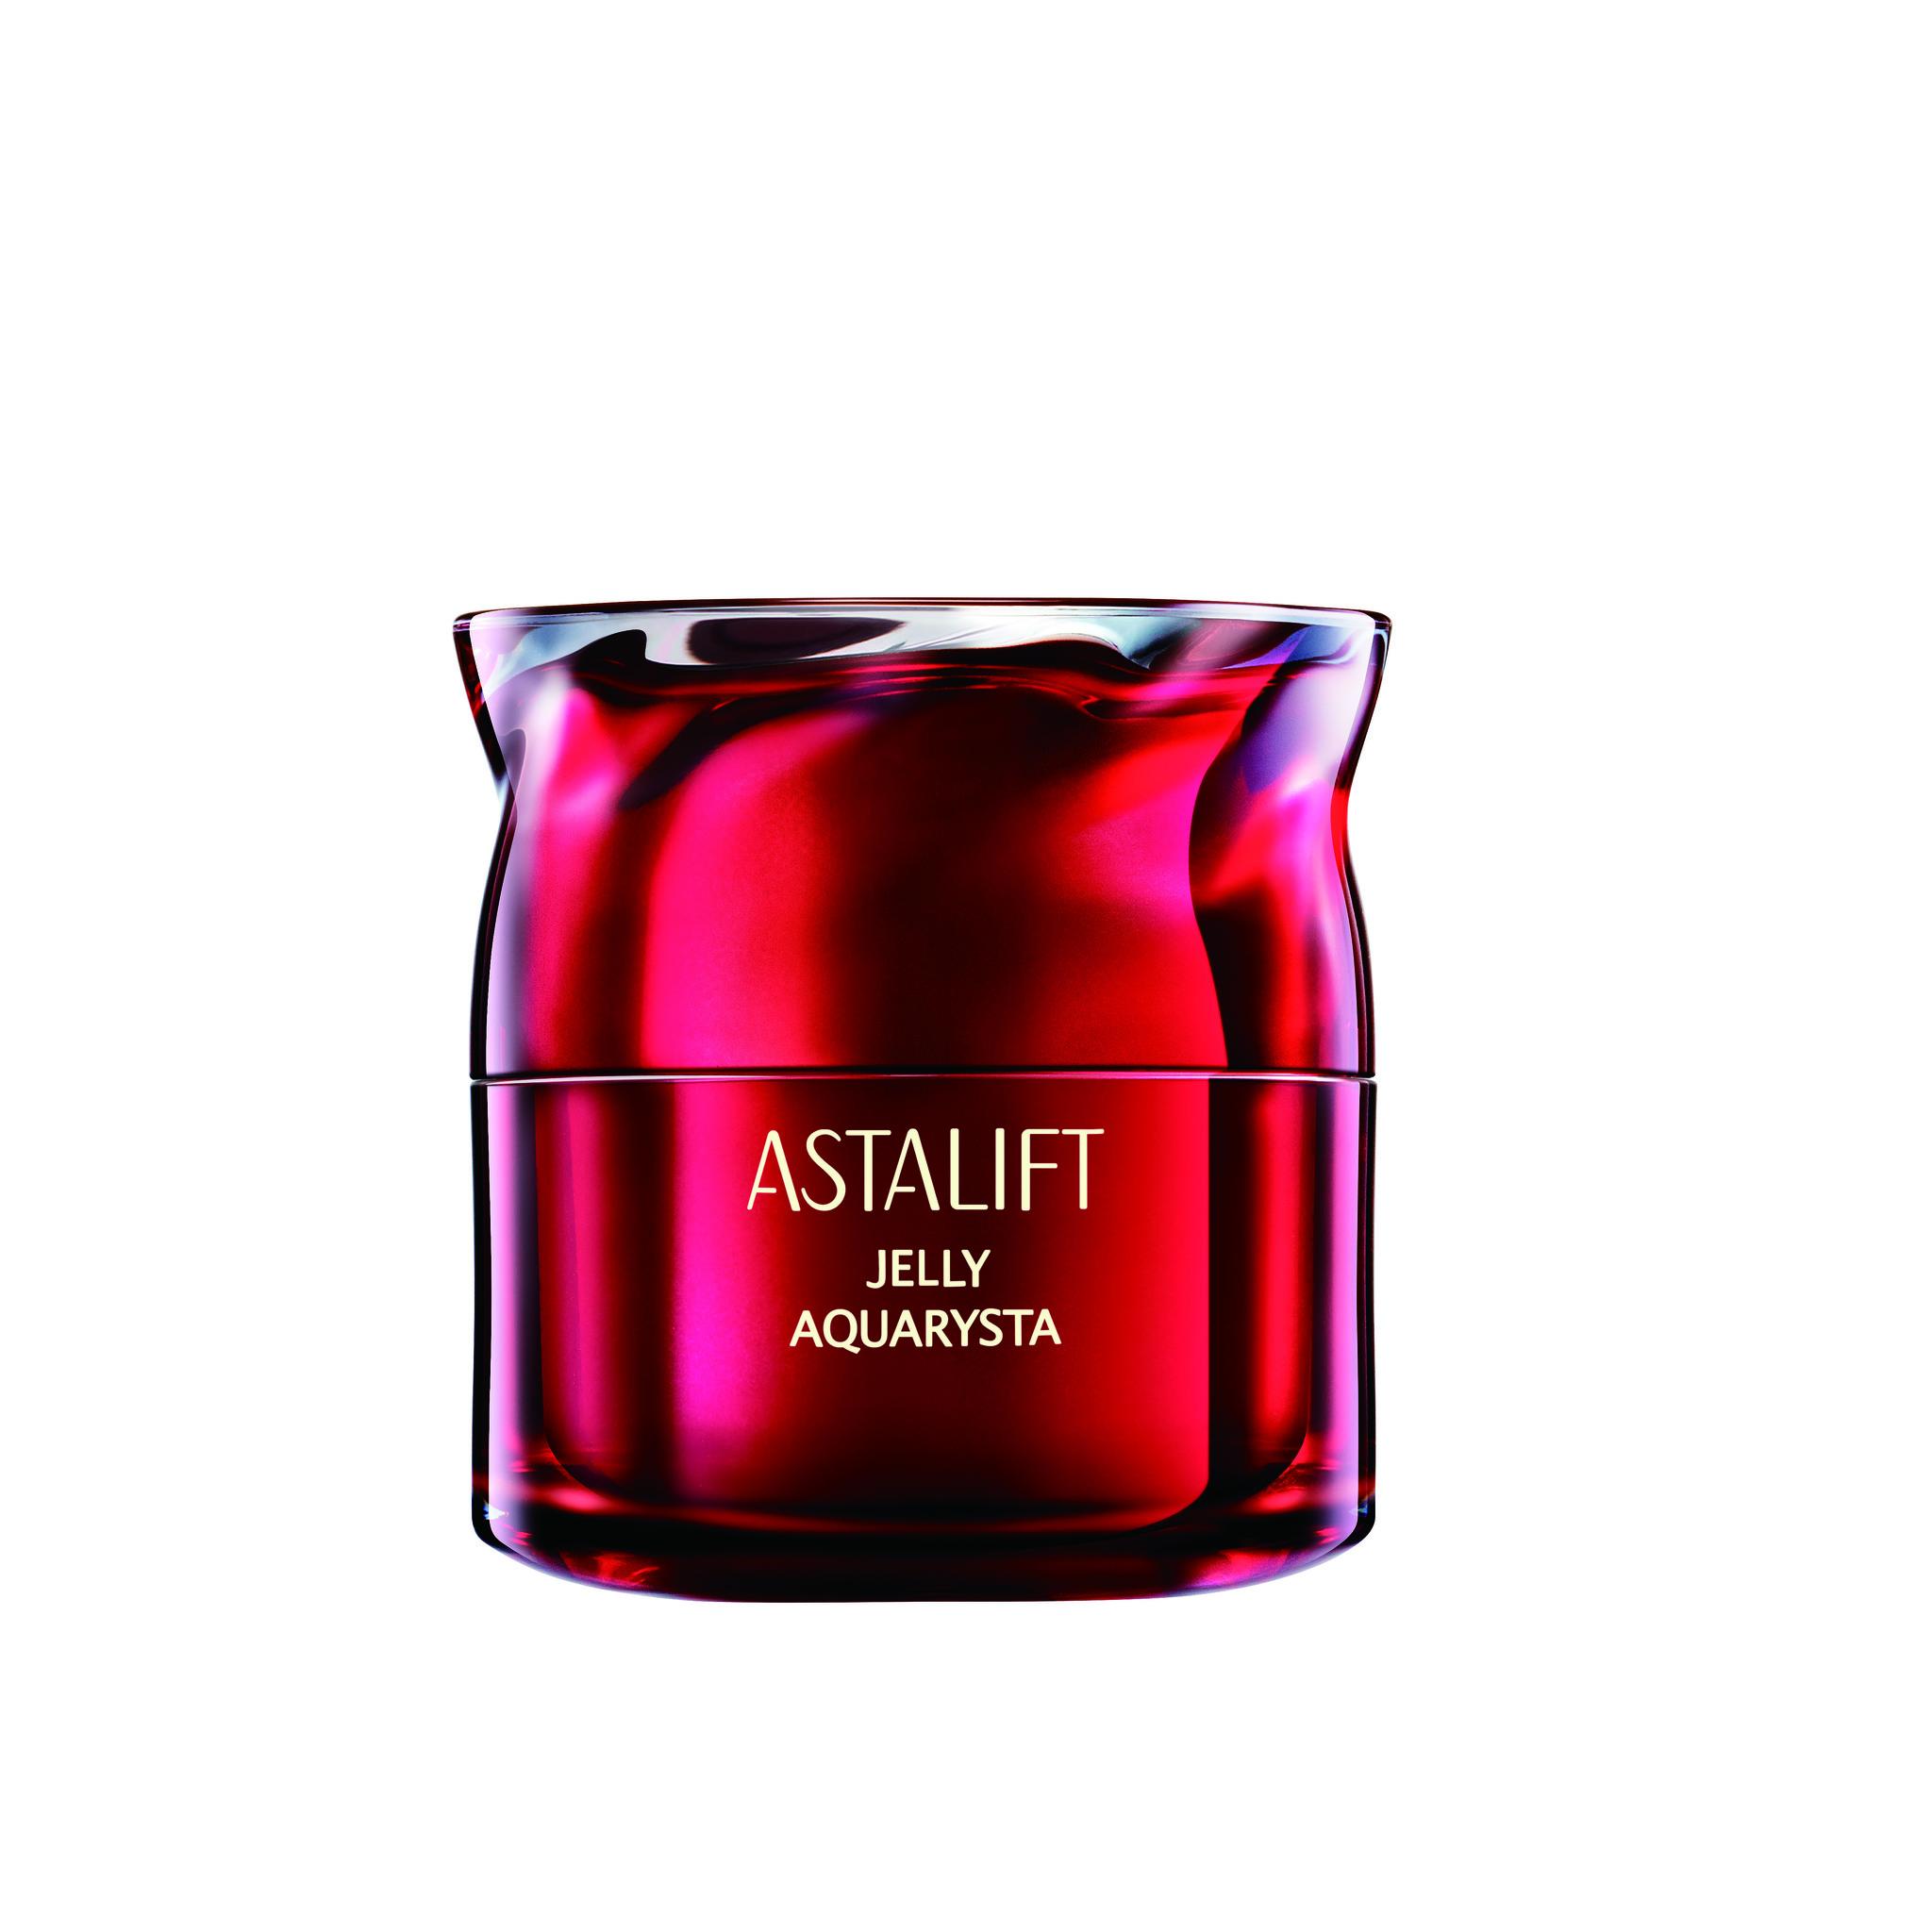 ASTALIFT Jelly Aquarista Омолаживающее желе-концентрат, 40 гр